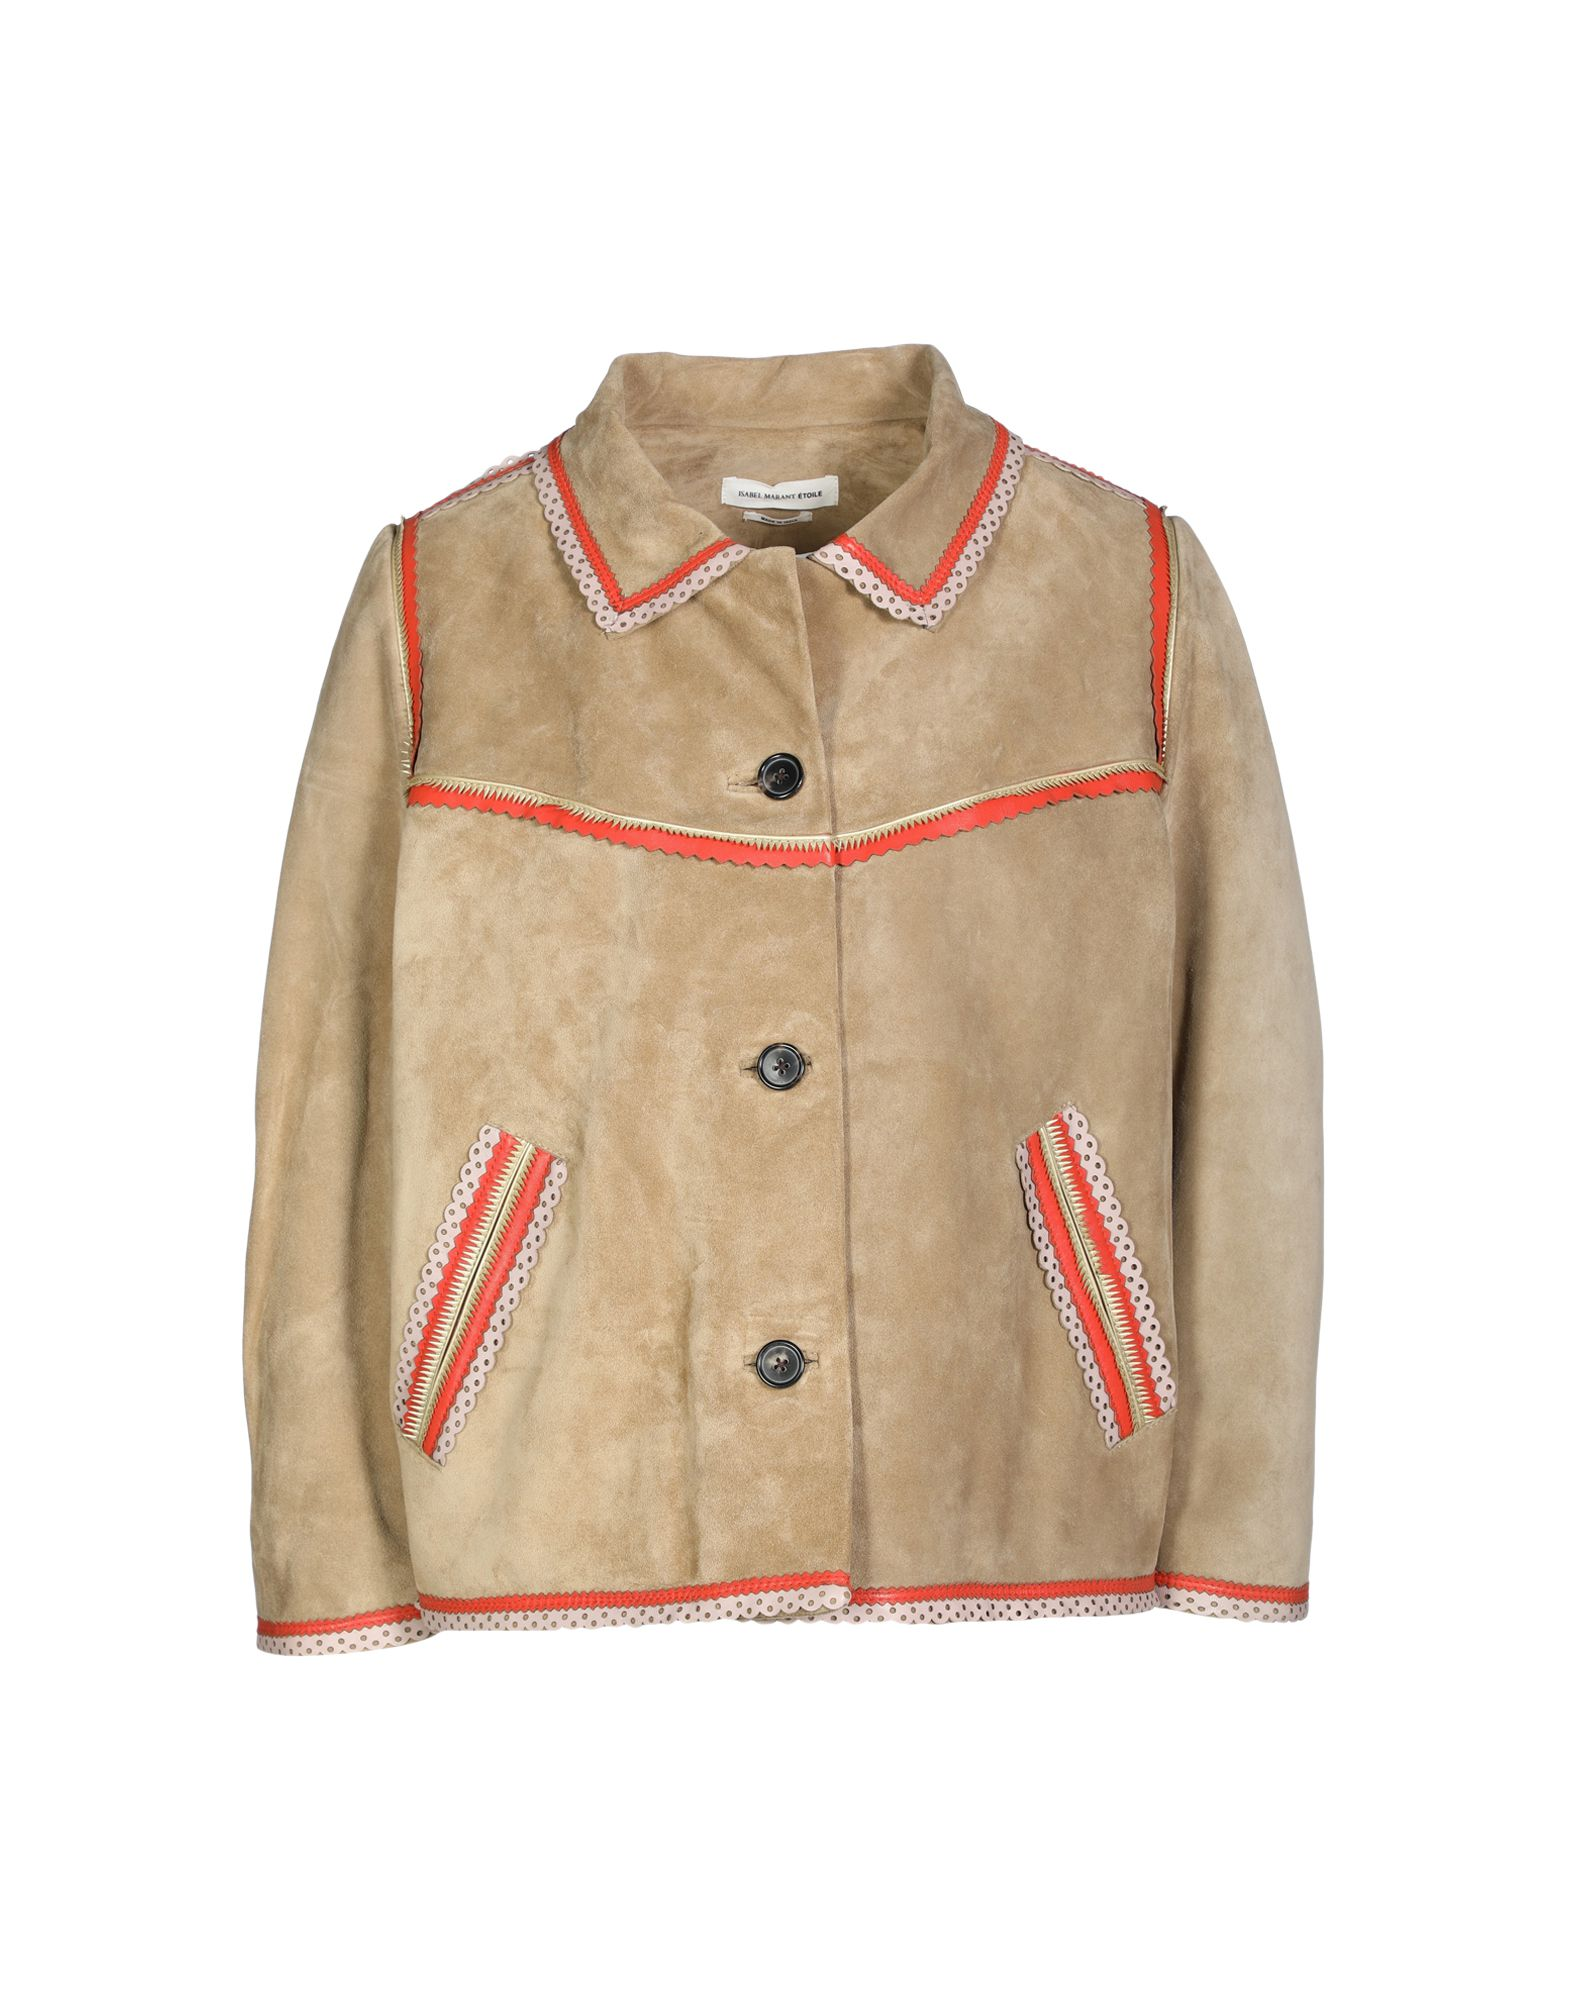 Gshop Gun 1280 Jaket Atleticoutdoor Pria Taslan Keren Hitam Daftar Gunung Reguler Cozmeed Arkana Leather Coats Jackets For Women Spring Summer And Fall Winter Collections